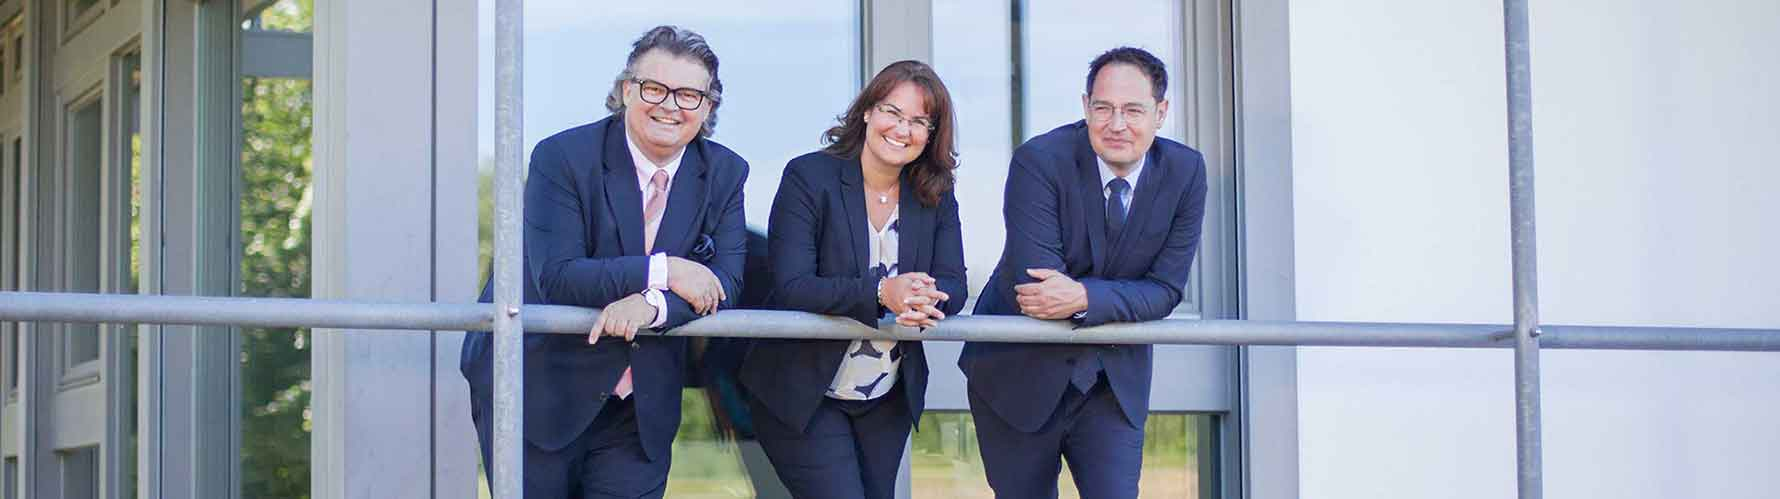 Quirmbach & Partner, ISO 9001 zertifiziert